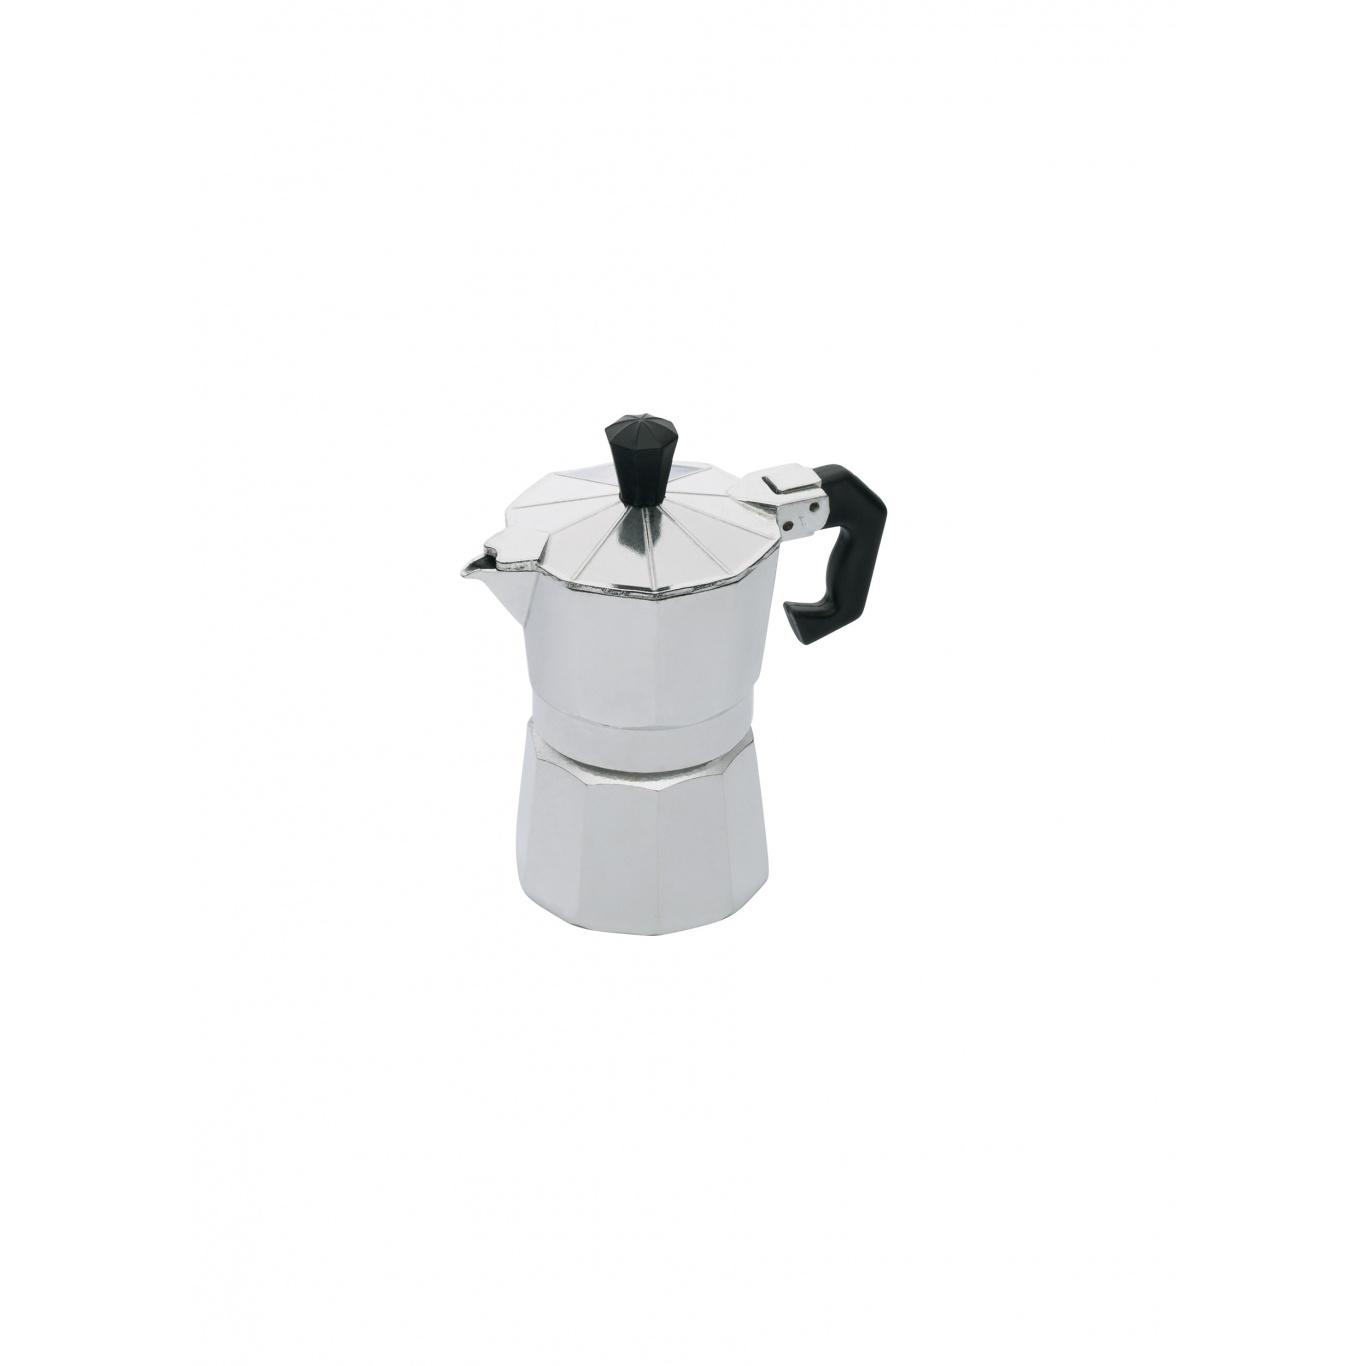 Image of Italian Style 1 Cup Espresso Maker